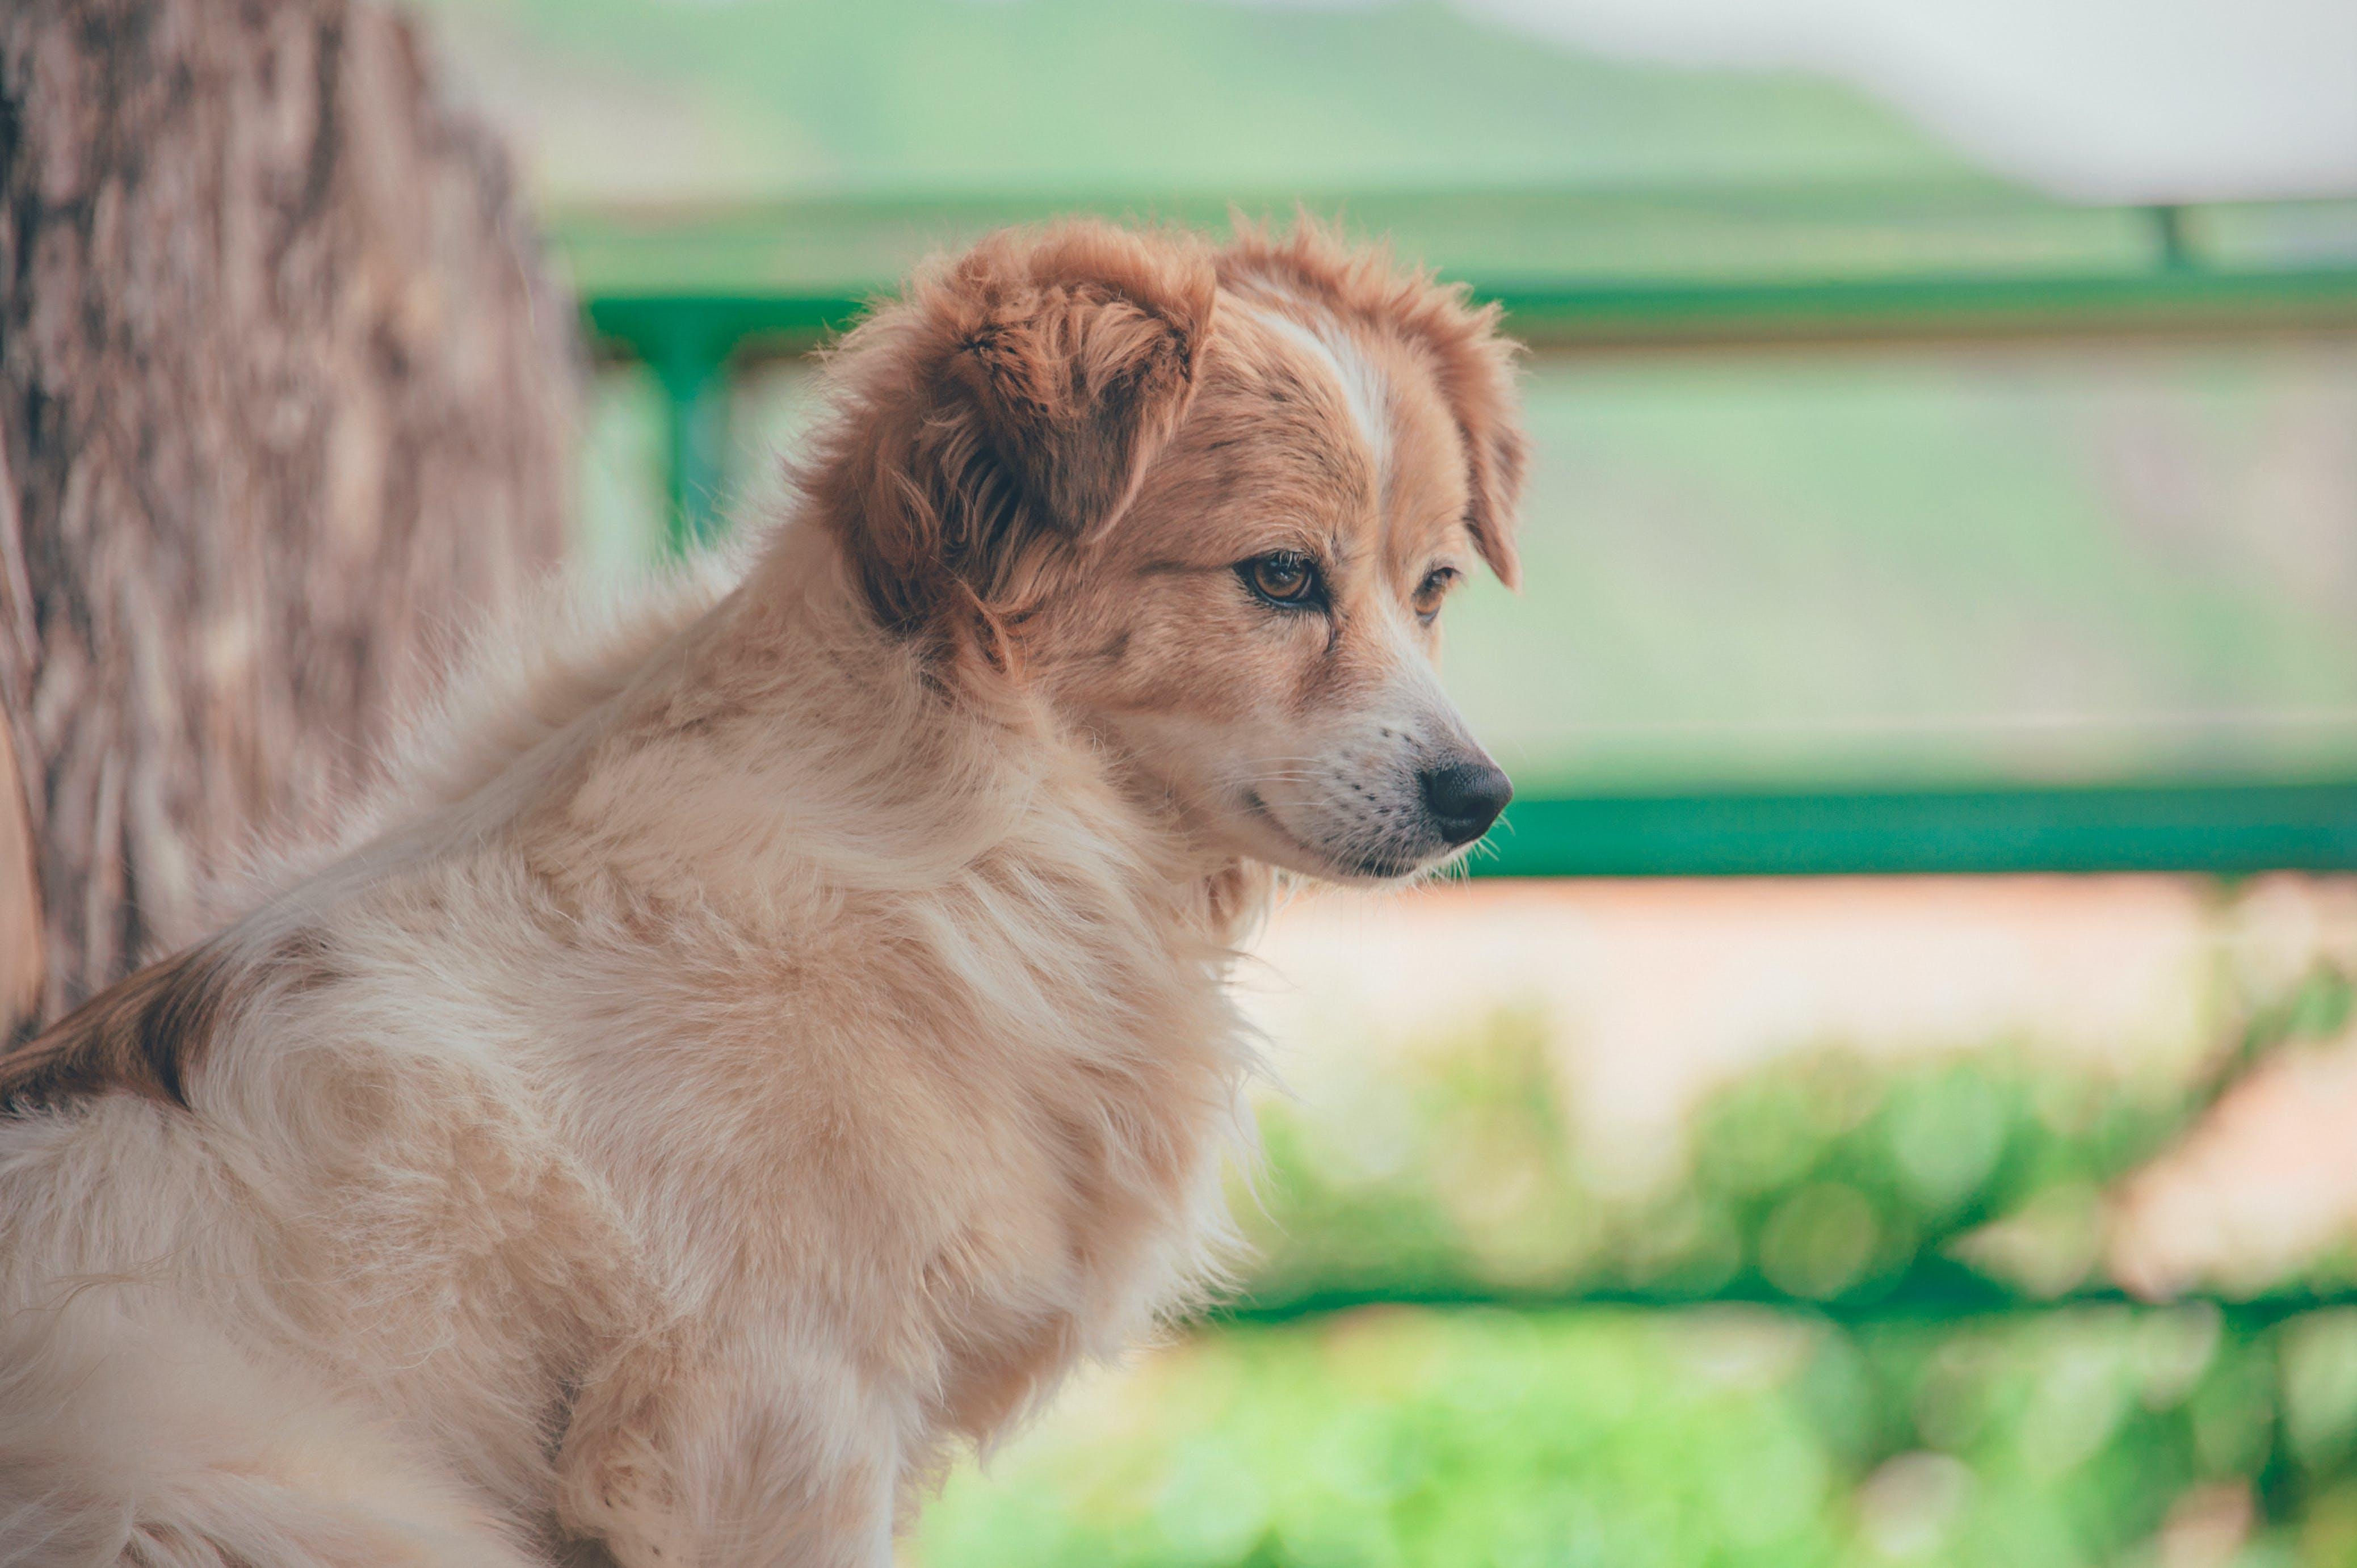 Close-Up Photography of Dog